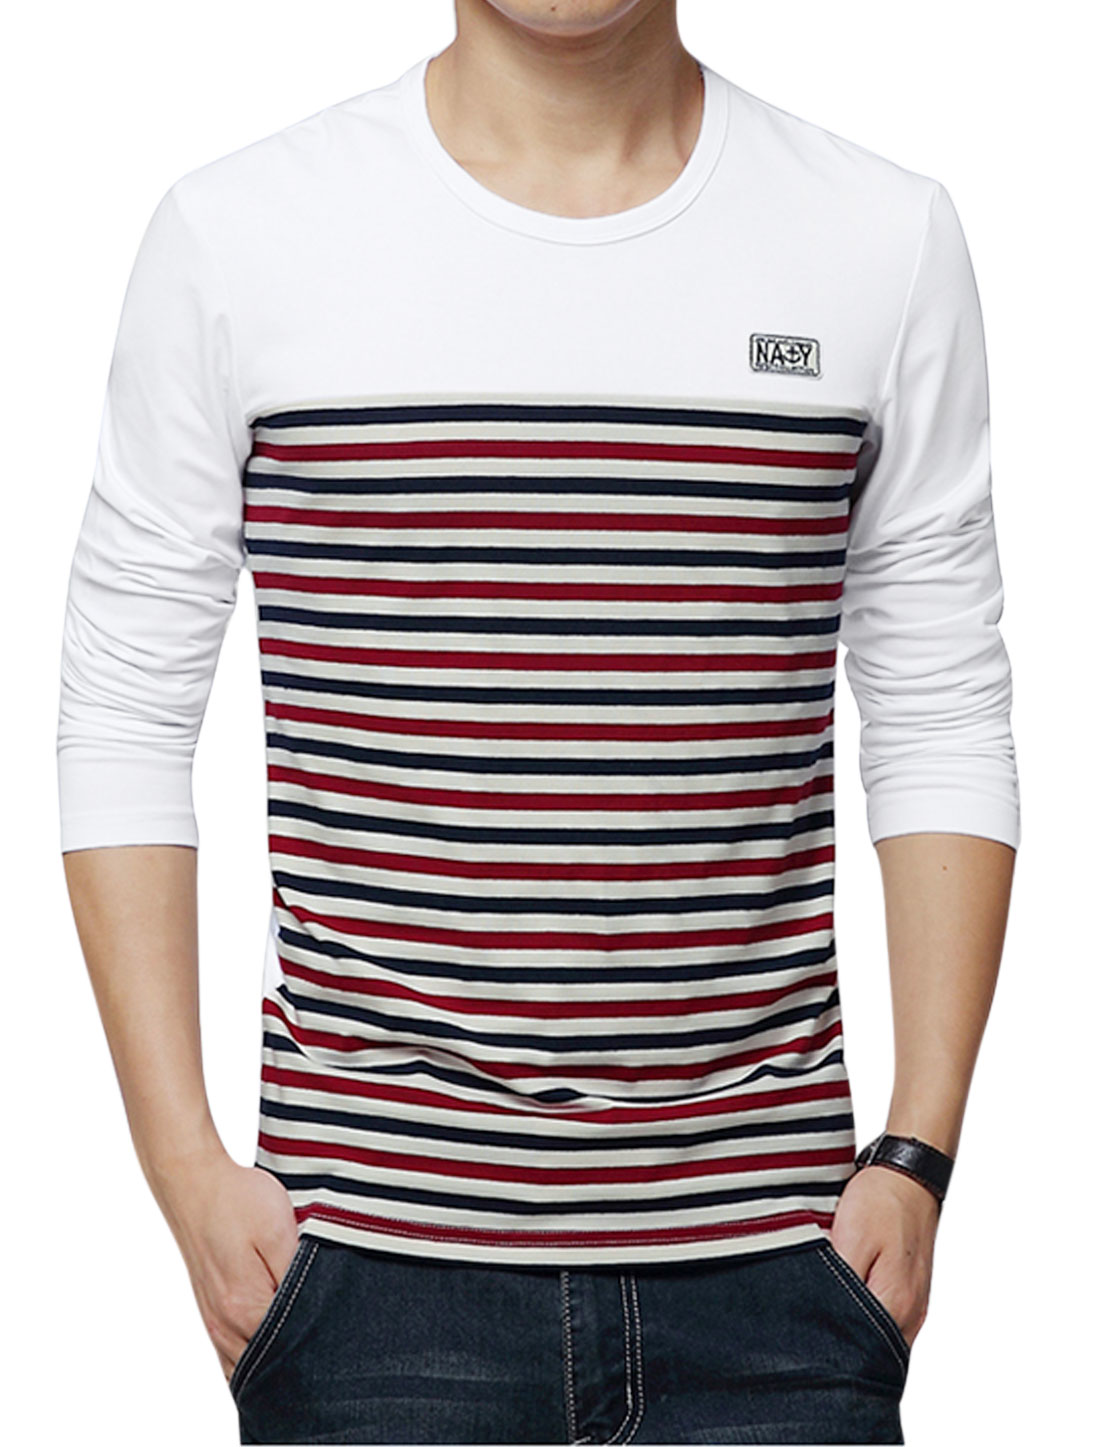 Men Long Sleeve Round Neck Stripes Print Slim Fit T-Shirts White Burgundy M